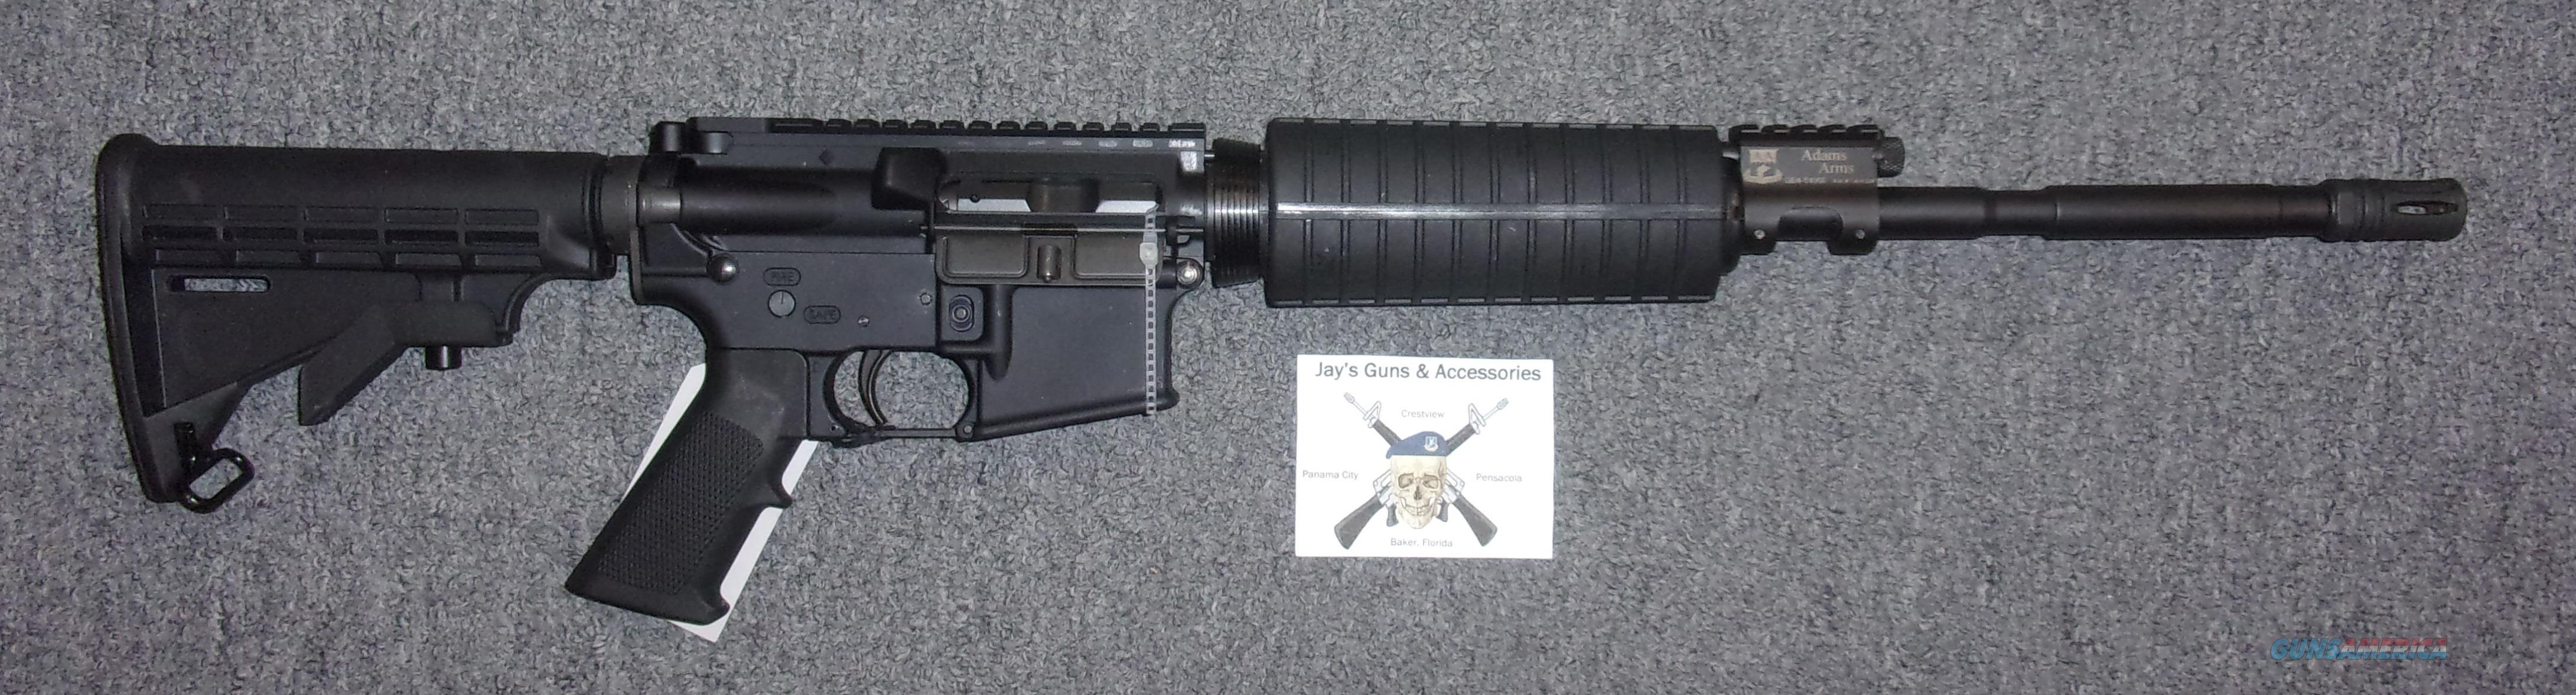 Adams Arms AA-15 (Gas Piston)  Guns > Rifles > AR-15 Rifles - Small Manufacturers > Complete Rifle